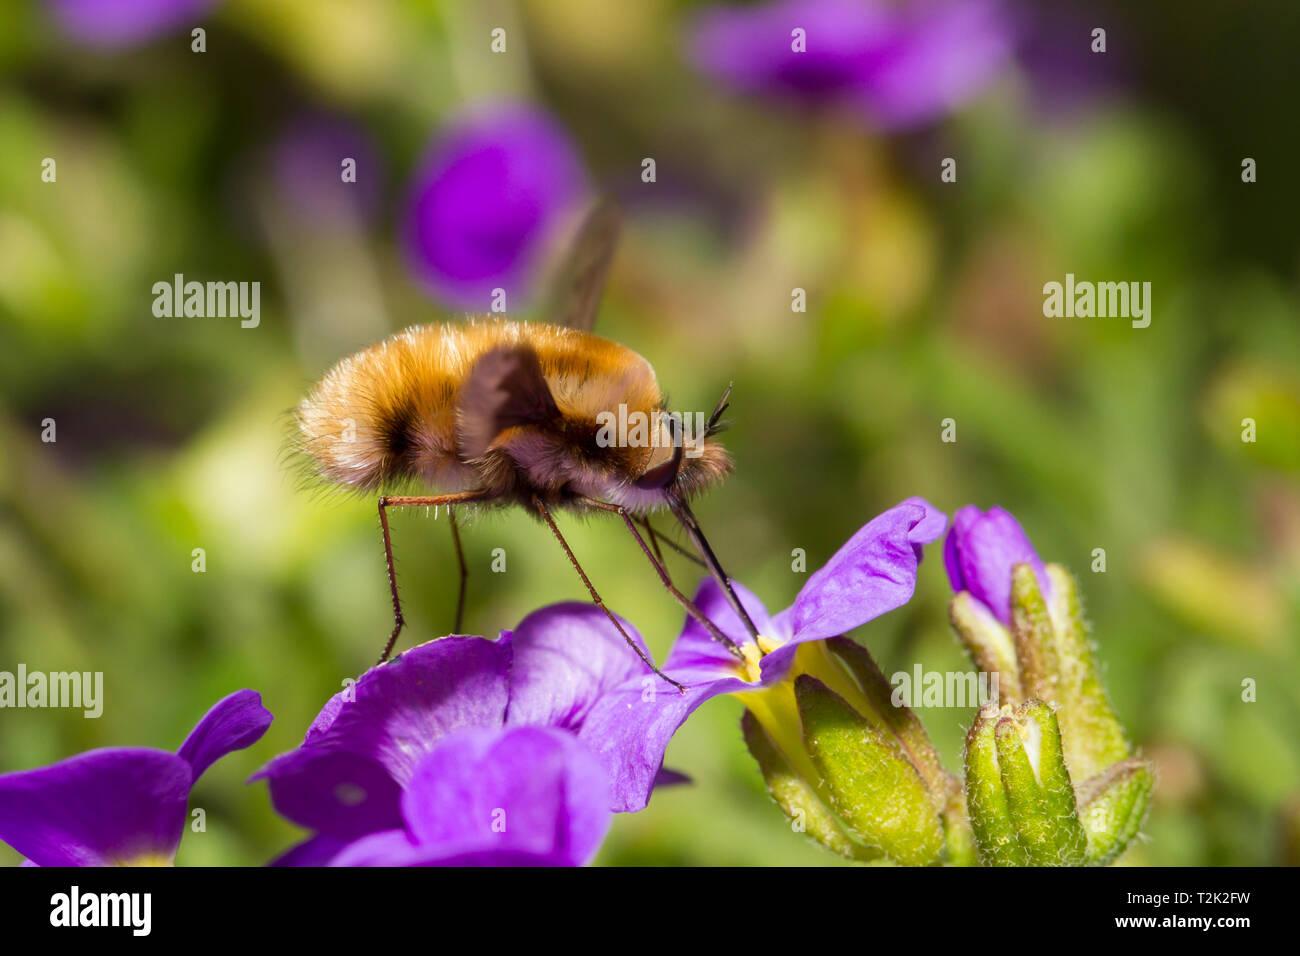 Grosser Wollschweber, Bombylius major, bee fly Stock Photo